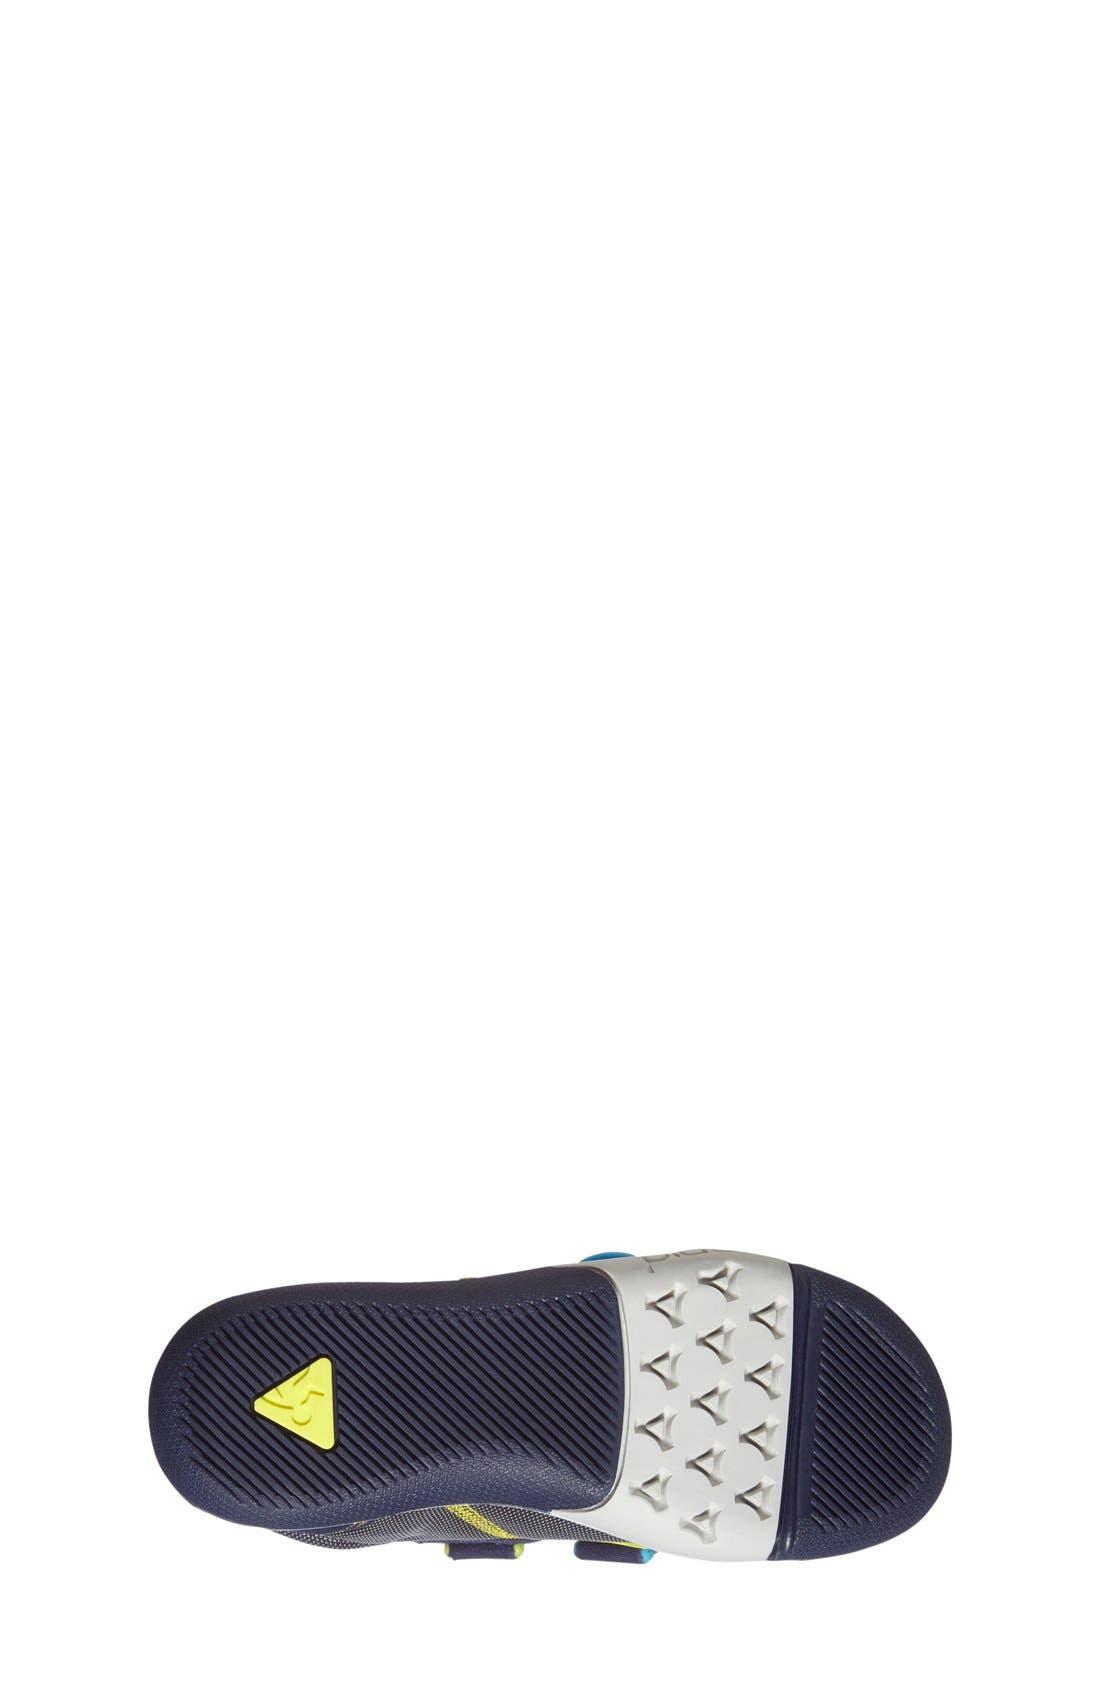 Ty Customizable Sneaker,                             Alternate thumbnail 4, color,                             NAVY/ STEEL